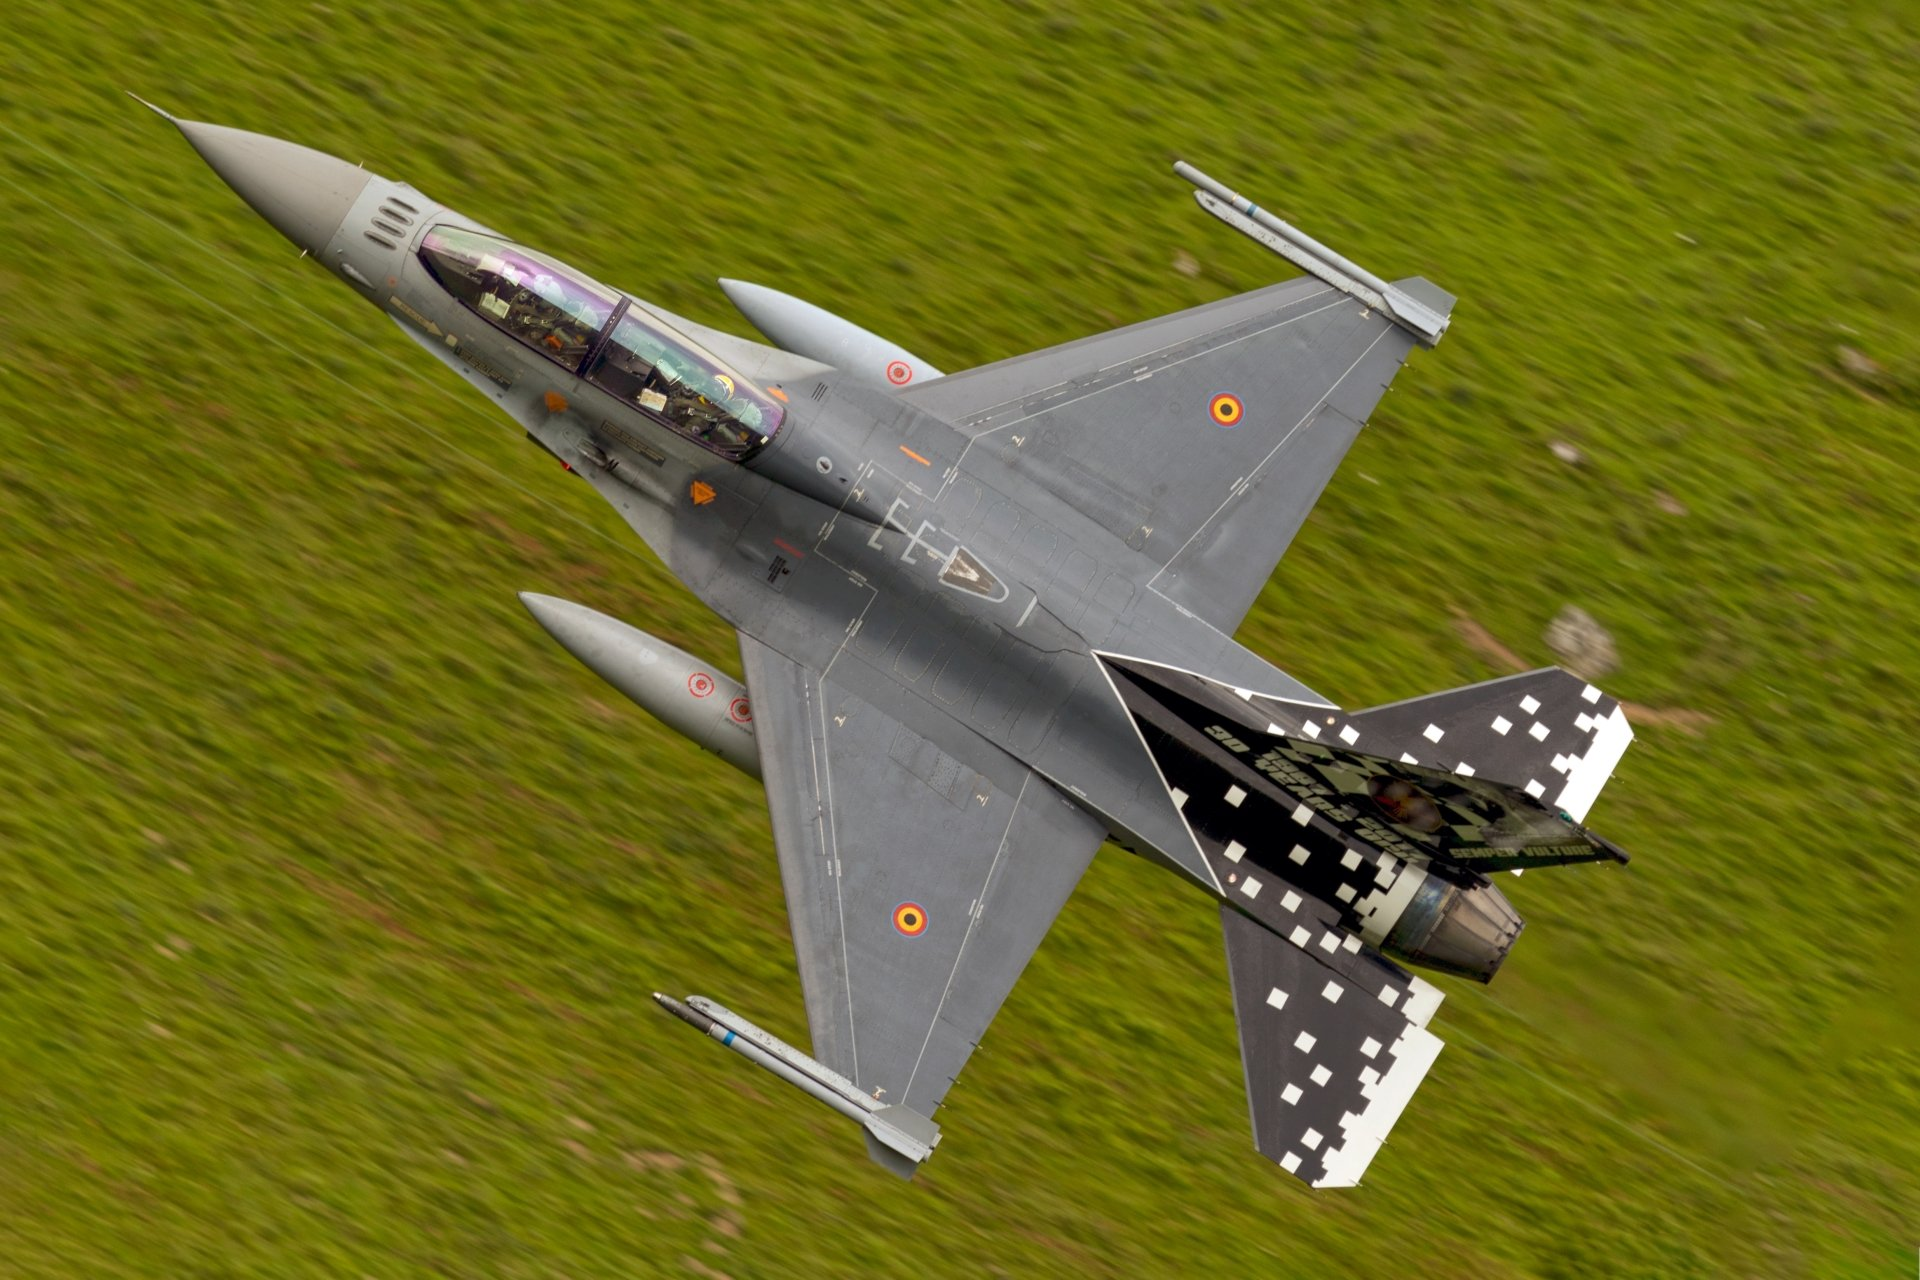 Military - General Dynamics F-16 Fighting Falcon  Jet Fighter Aircraft Warplane Wallpaper